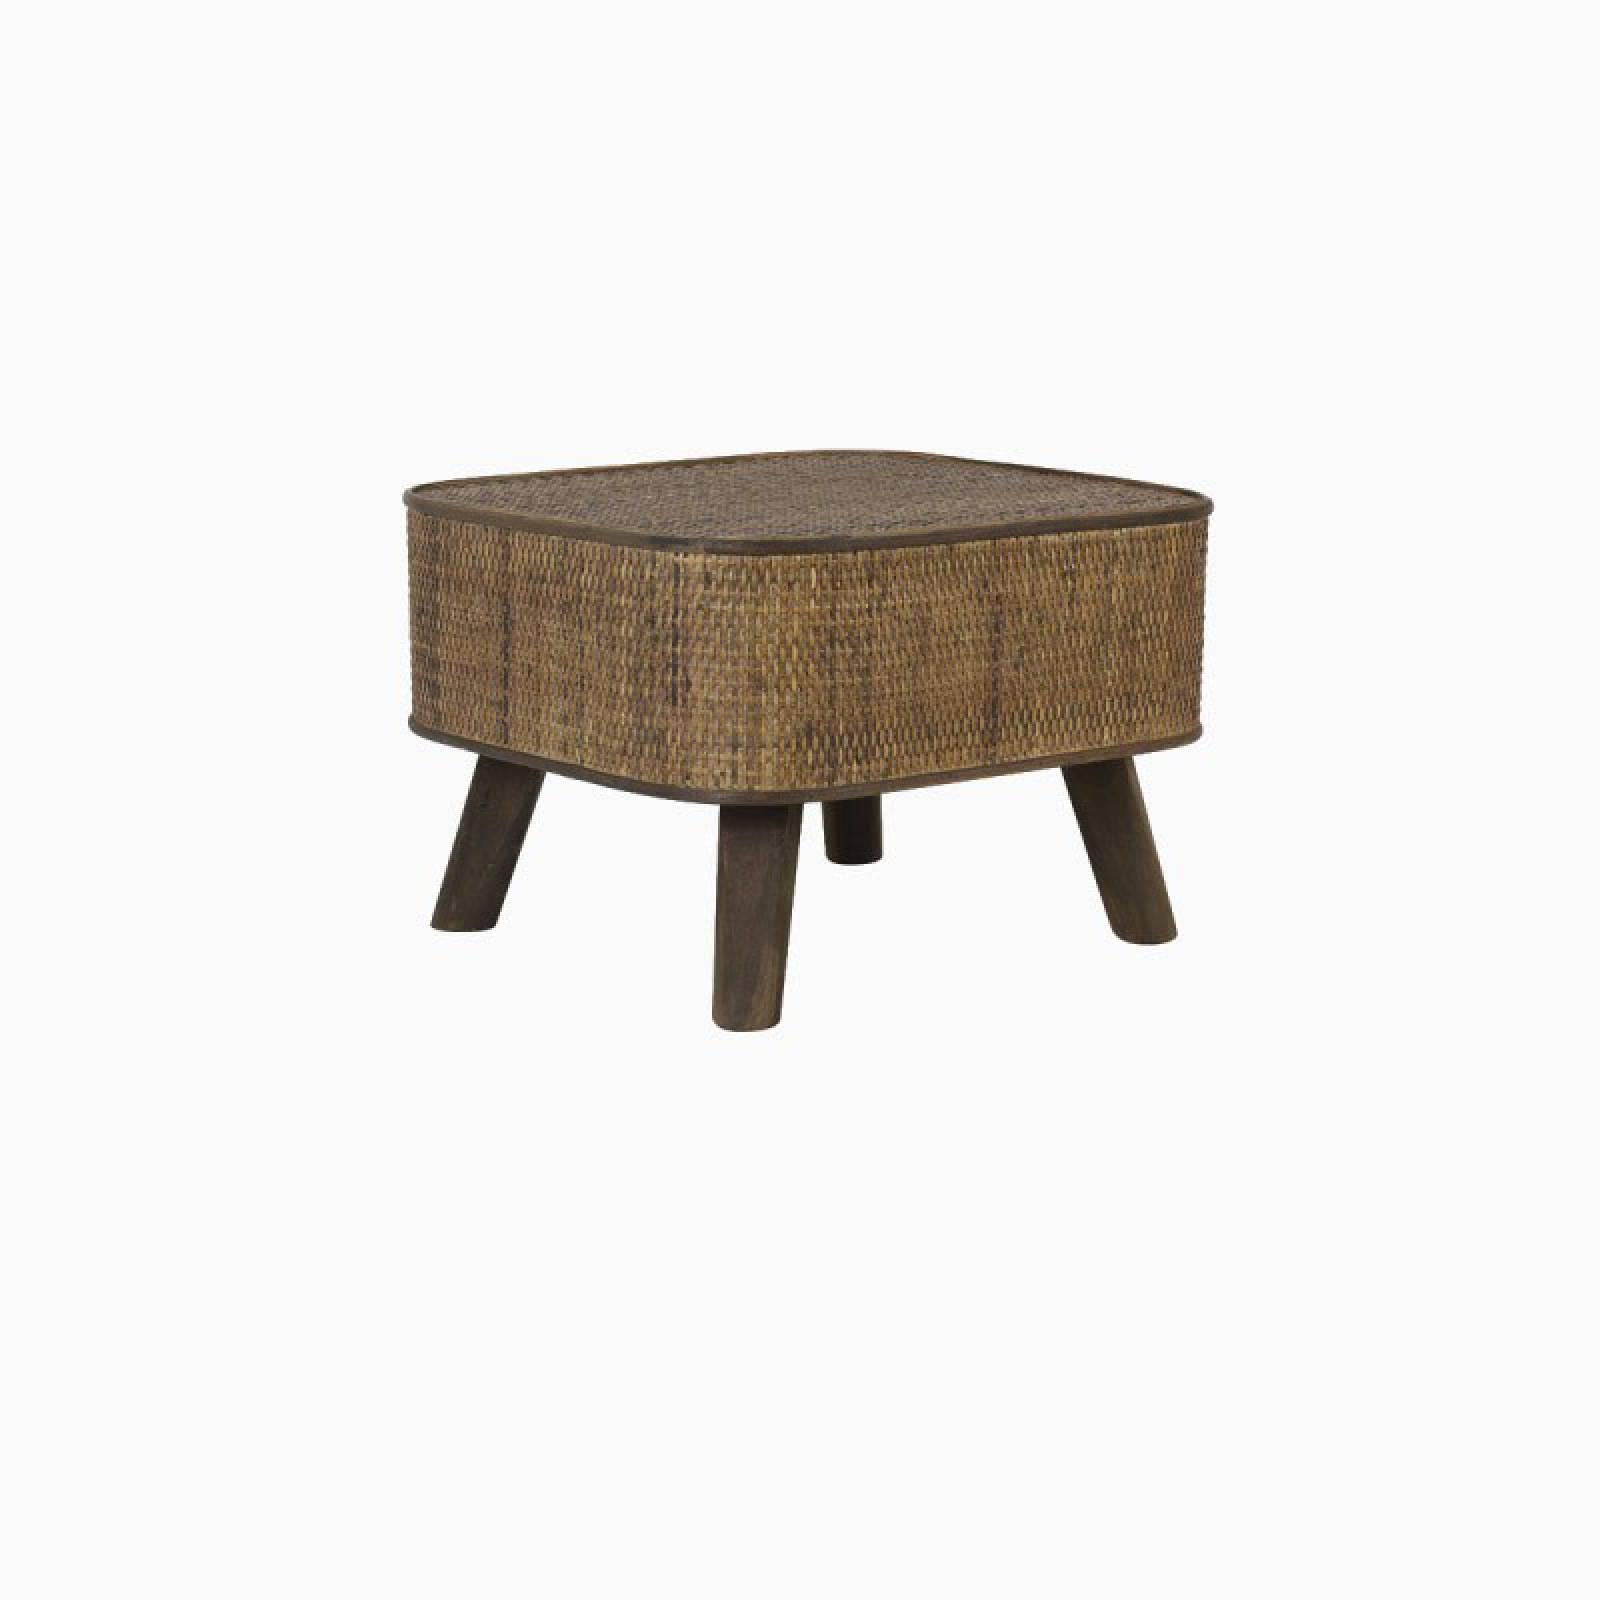 Canya Rectangular Woven Cane Side Table In Dark